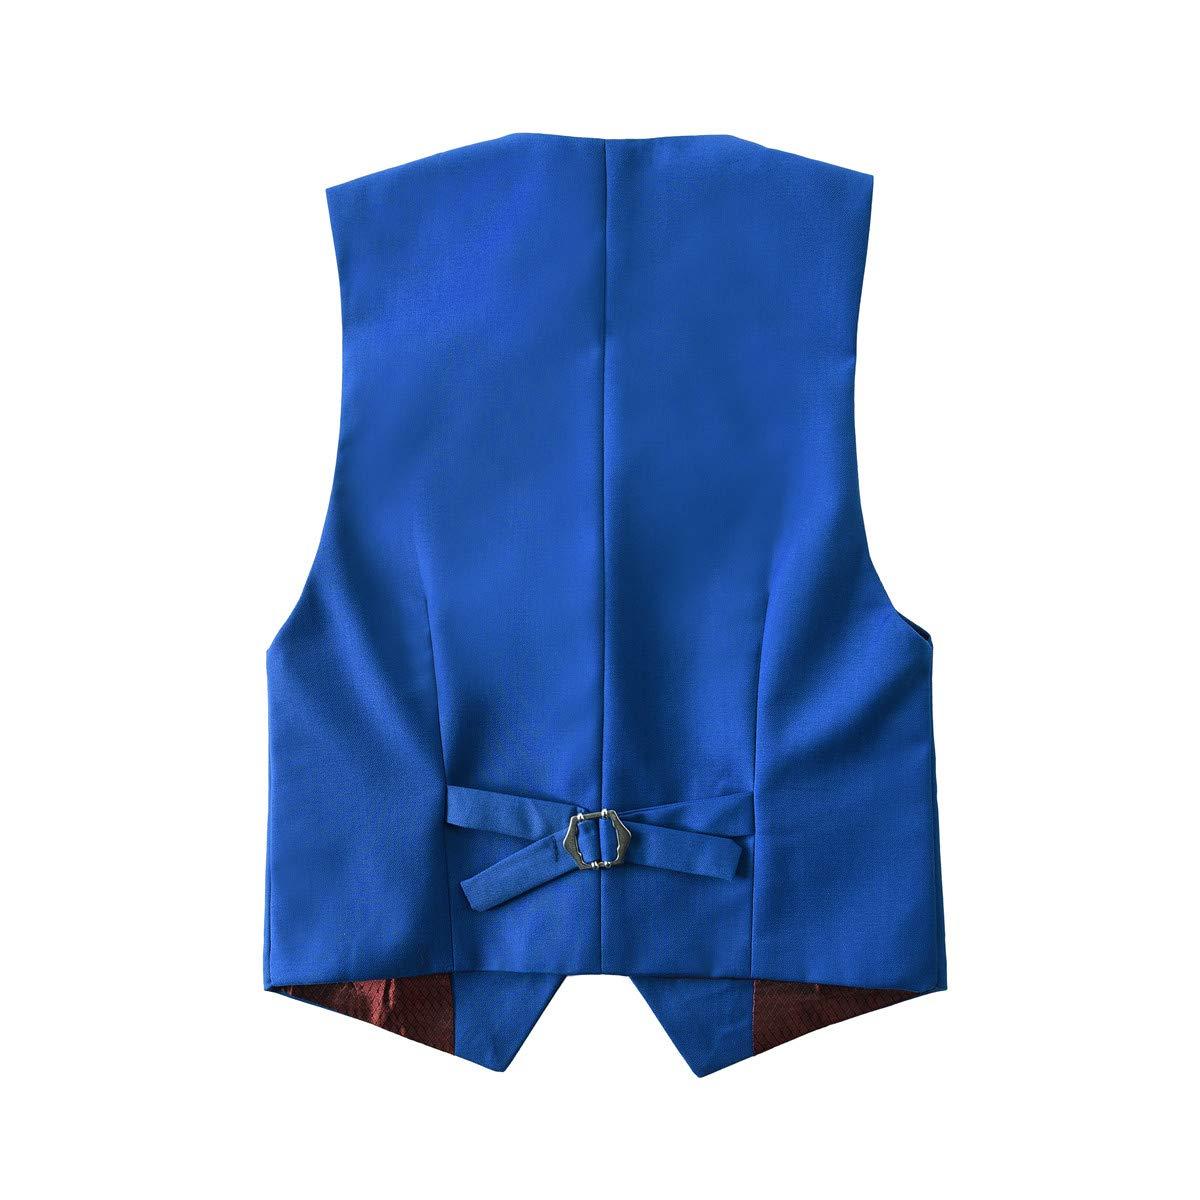 Yanlu Boys Tuxedos Toddler Formal Suits Set Kids Blue Black Slim Fit Suit for Weddings